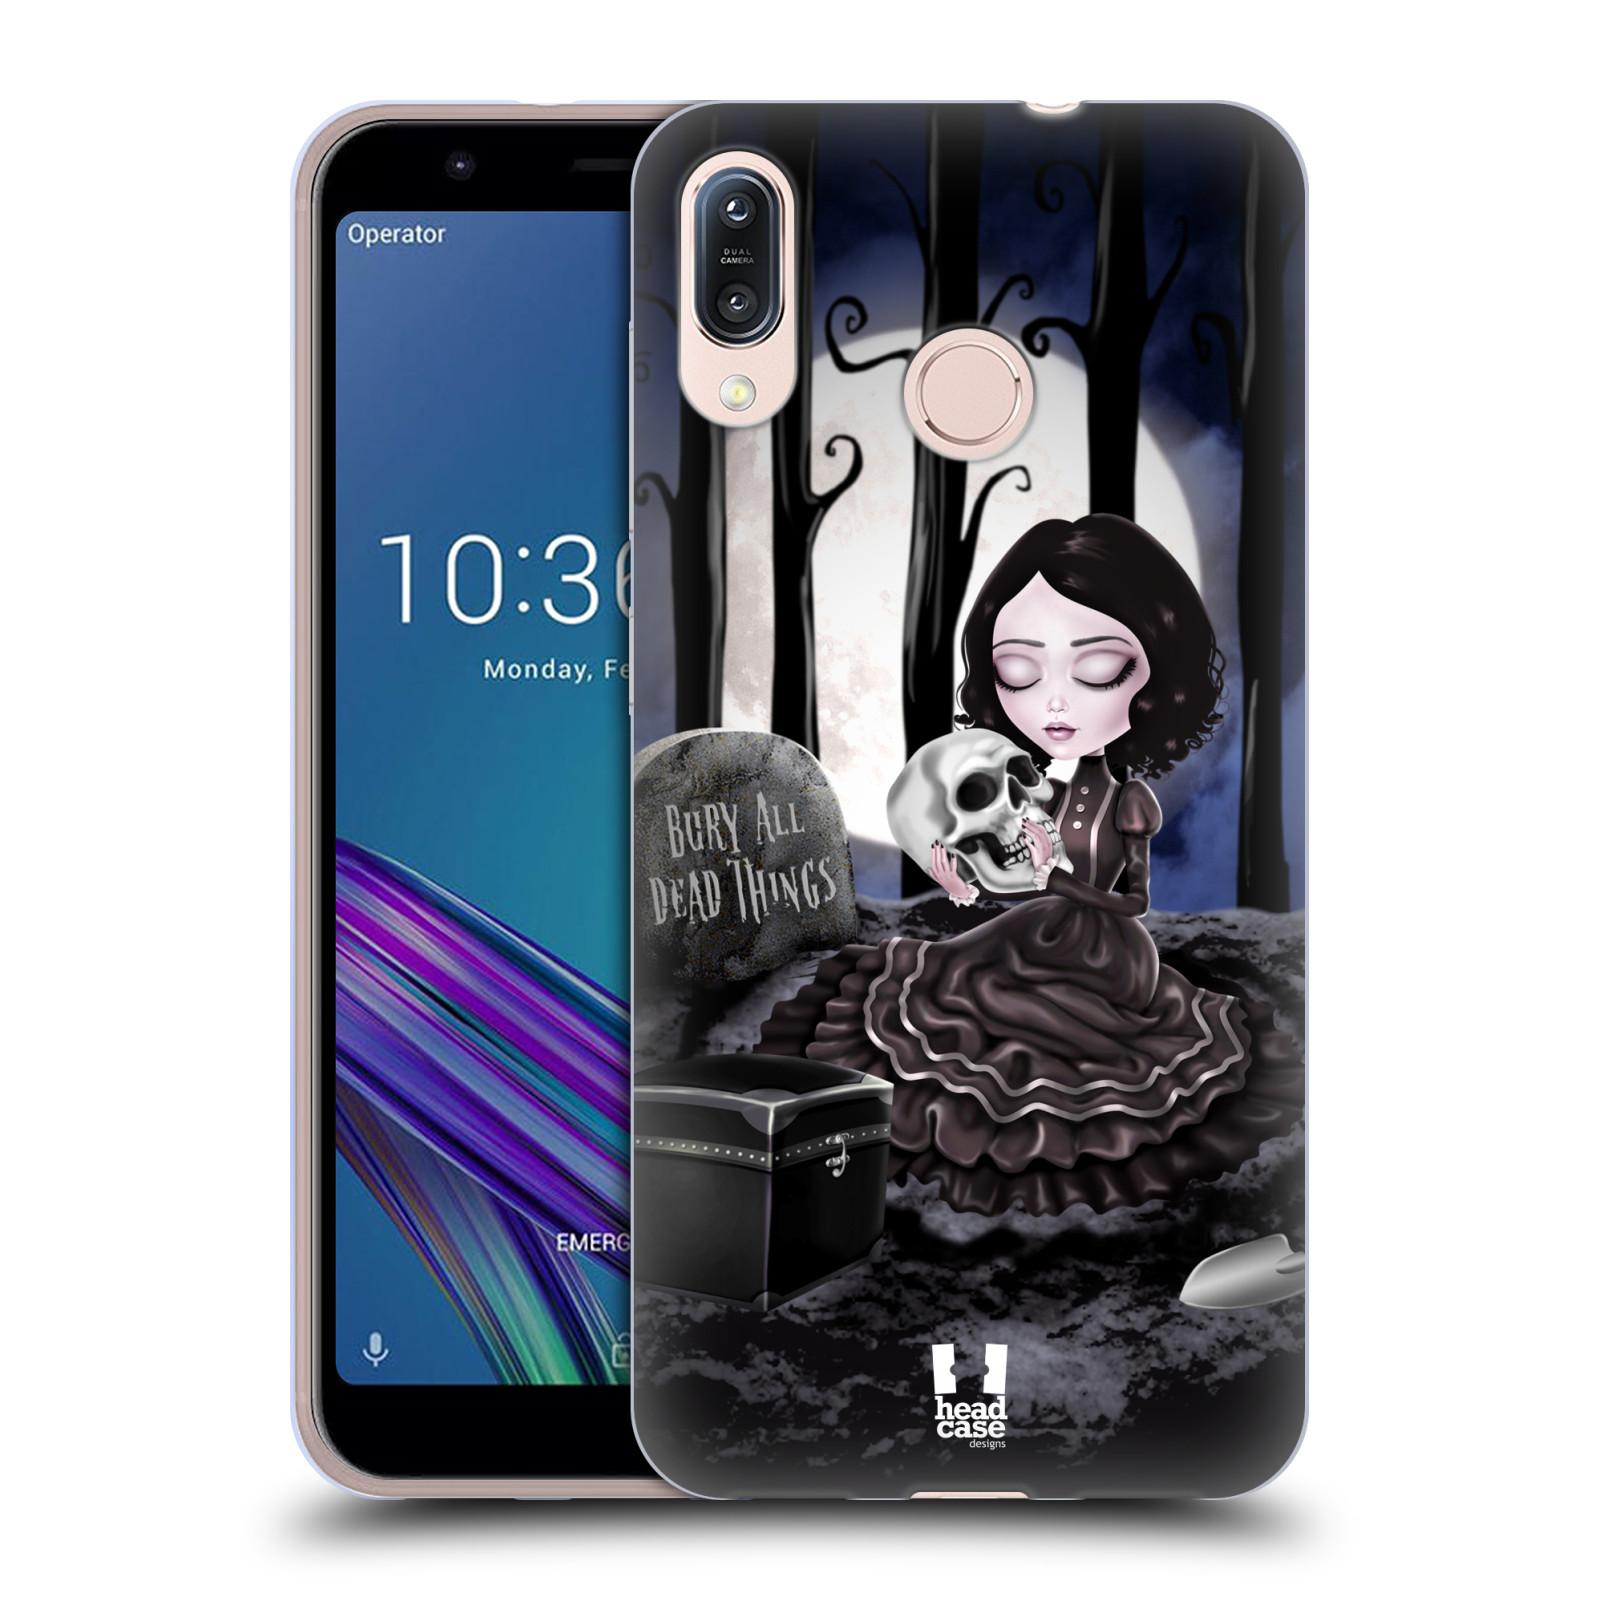 Silikonové pouzdro na mobil Asus Zenfone Max M1 ZB555KL - Head Case - MACABRE HŘBITOV